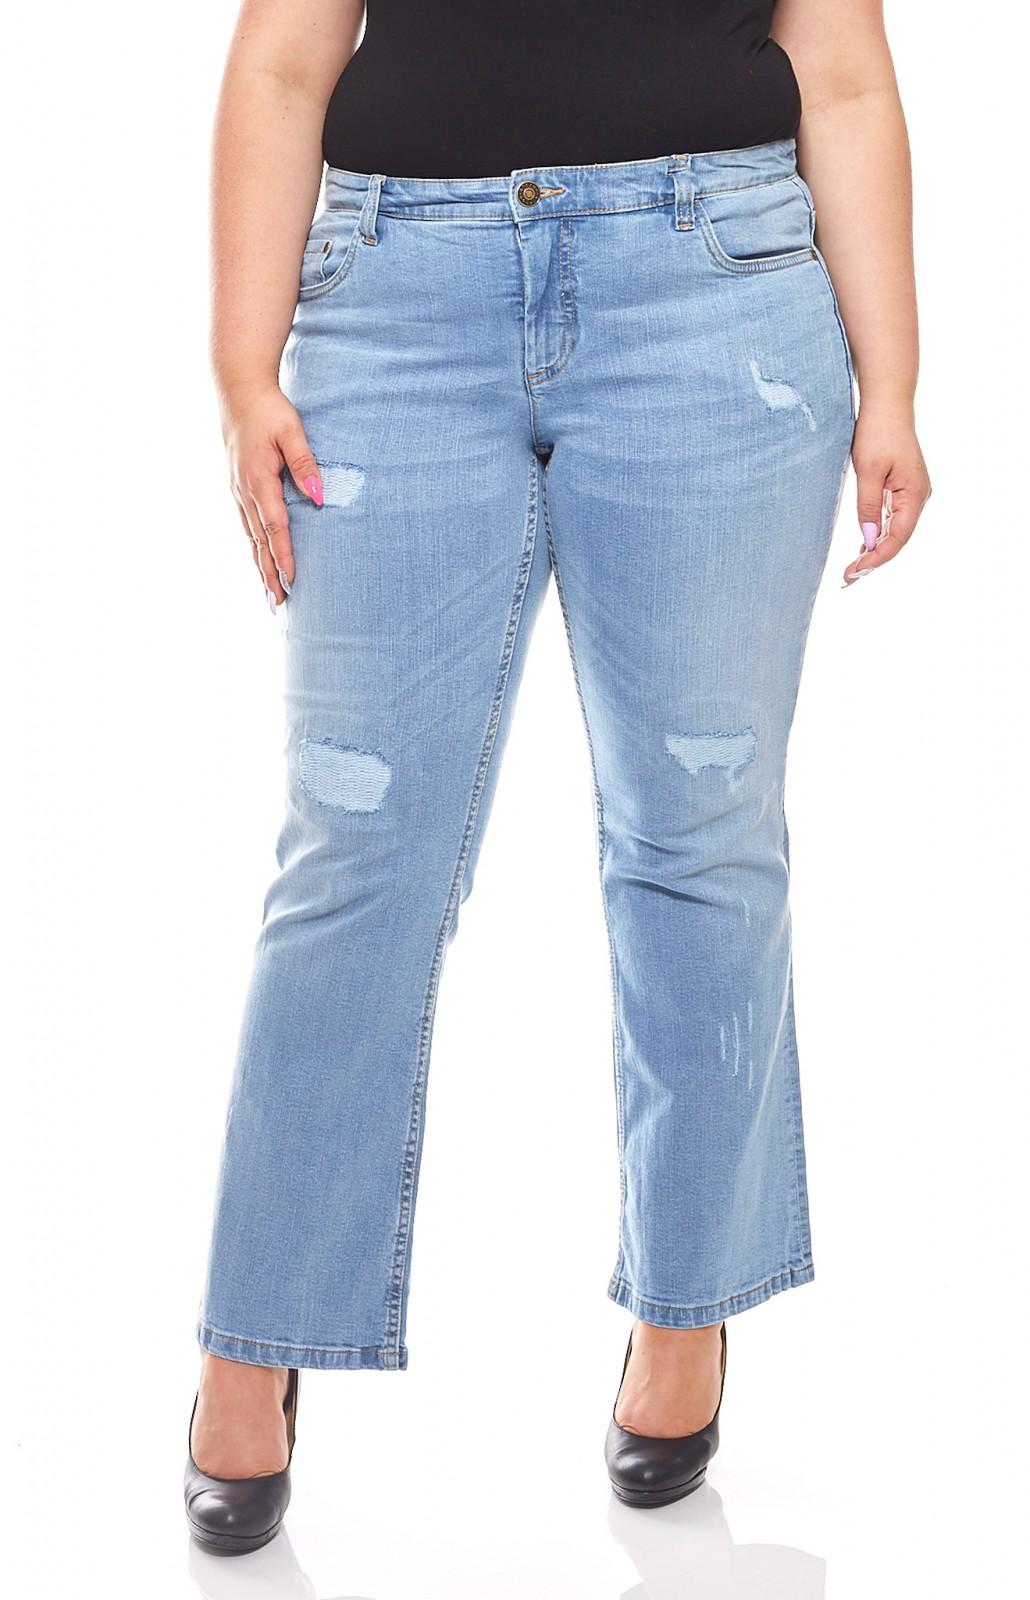 3befa590e5fc sheego Damen Stretch-Jeans Used-Look Langgröße Große Größen Blau